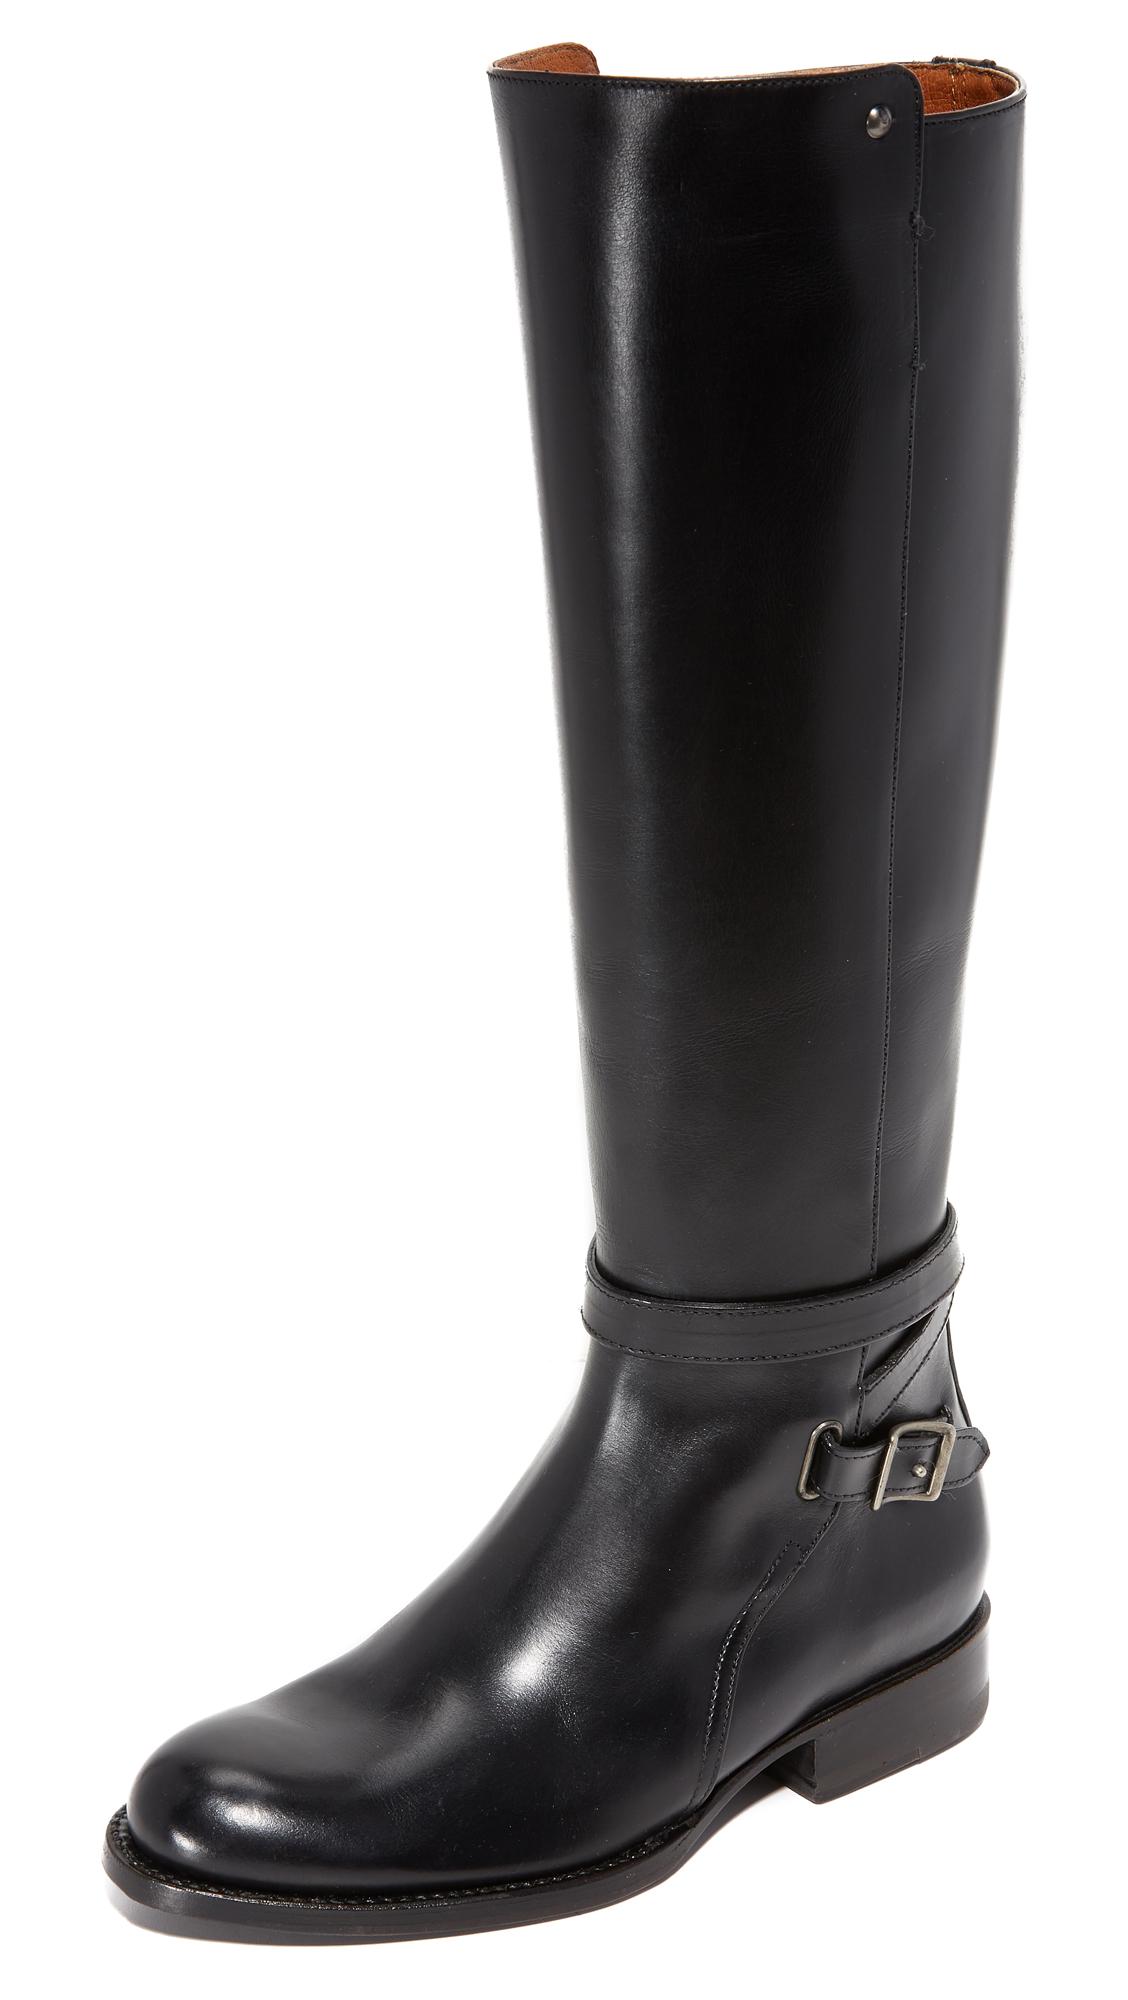 Frye Jordan Strappy Tall Boots - Black